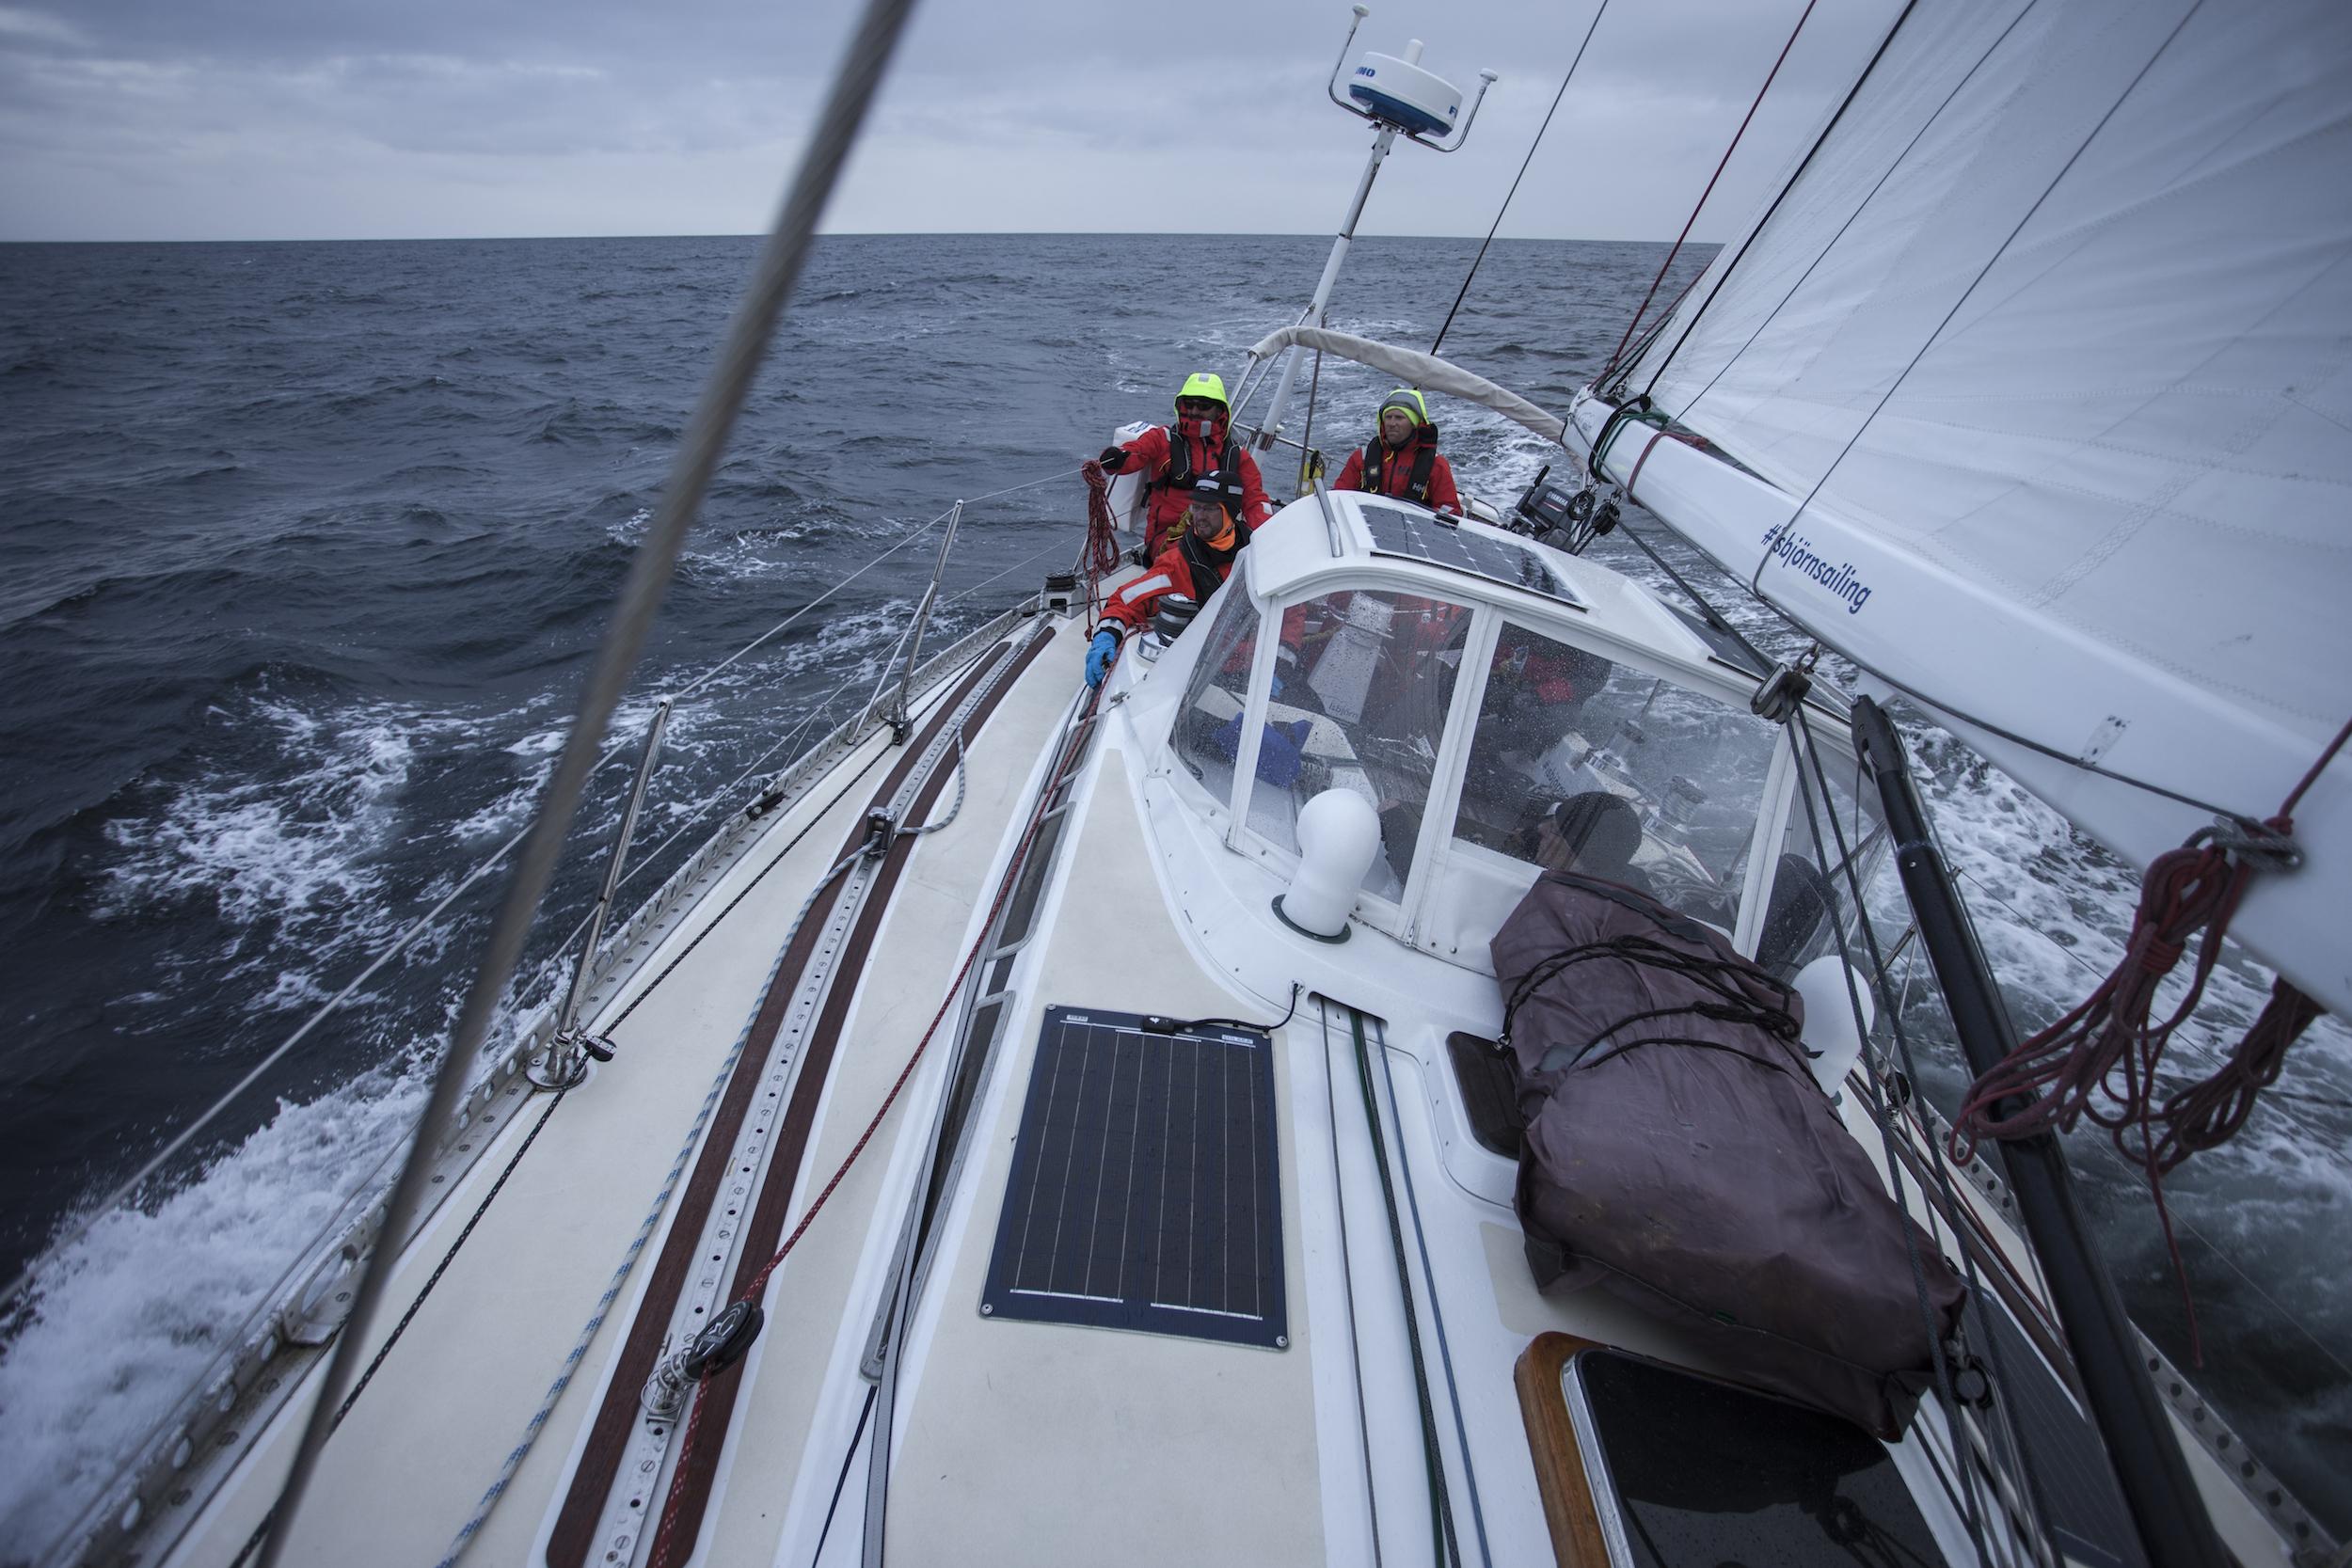 It got WINDY as we crossed Hornsund to make our landfall in Spitsbergen.